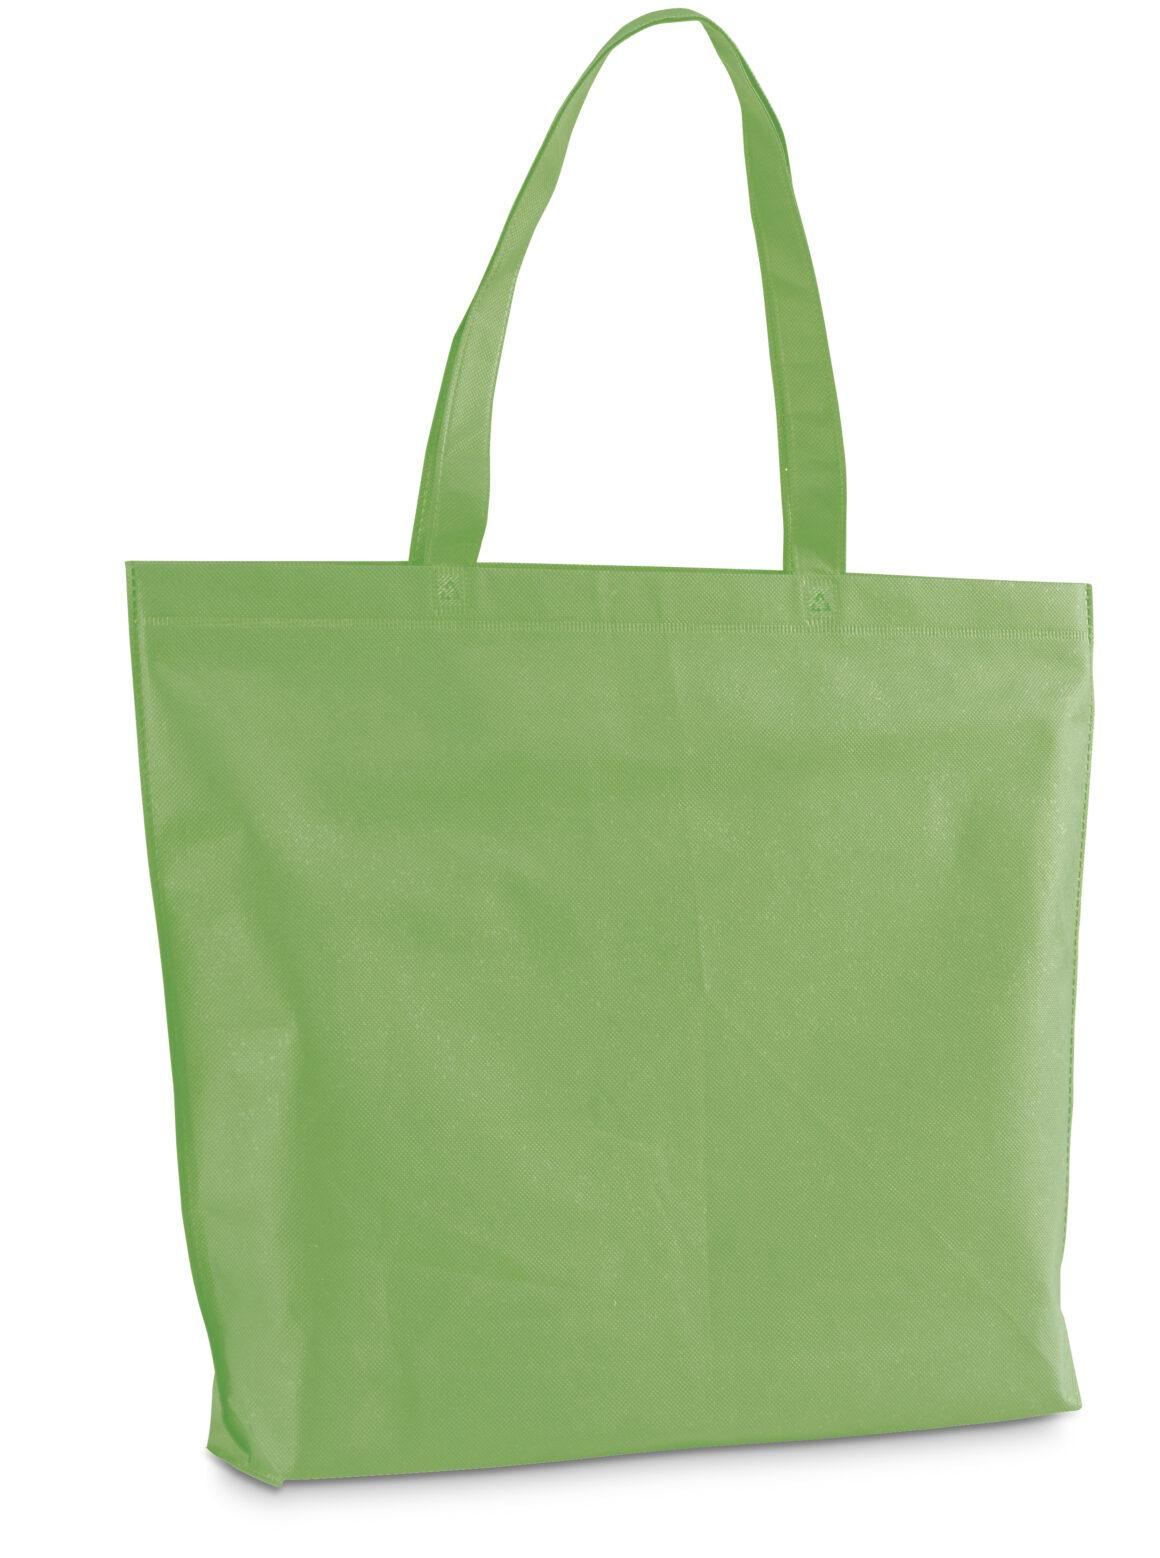 Pencoose Eco-friendly Bag Product Code GP92497